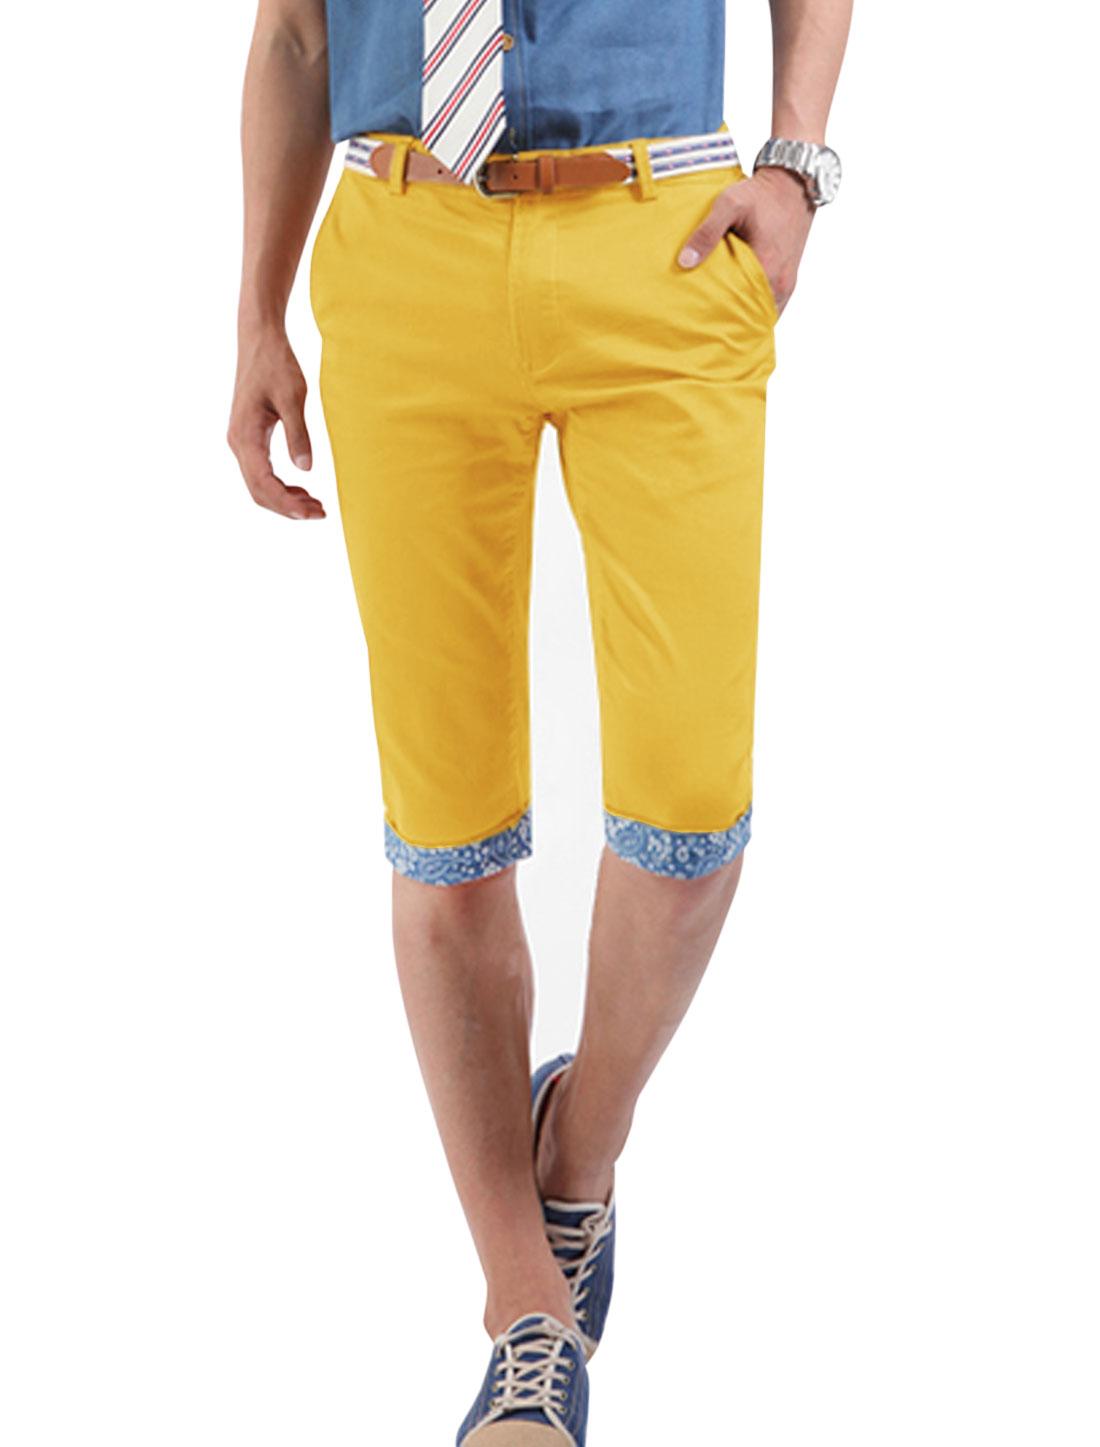 Men Slant Pockets Zip Fly Cuffed Slim Fit Half Pants Dark Yellow W30